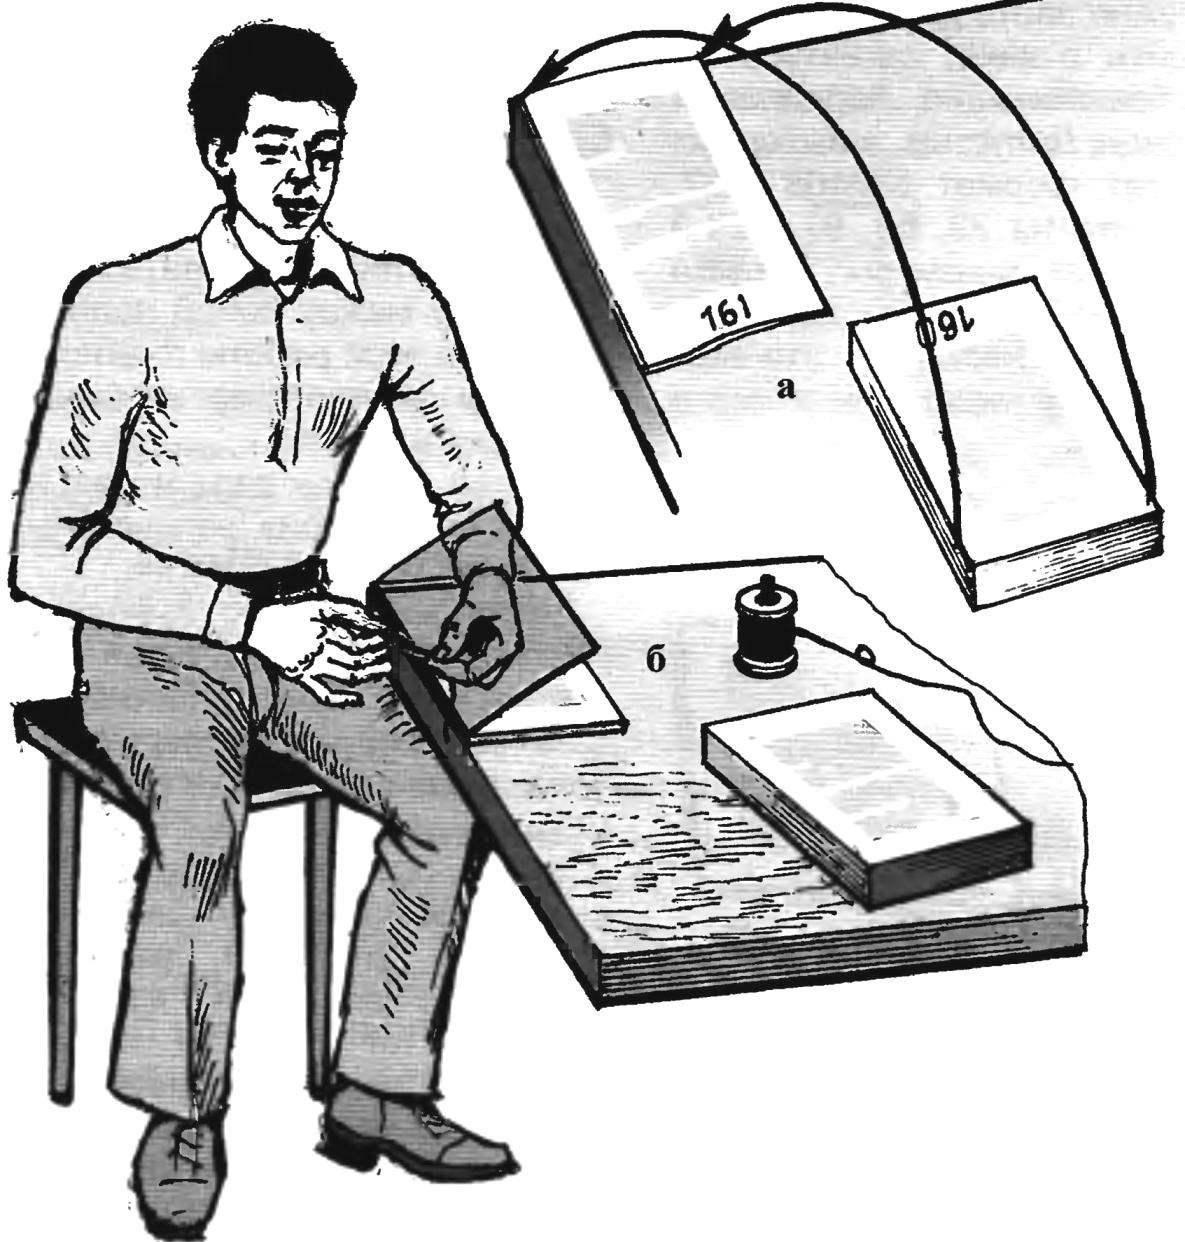 Рис. 4. Шитьё тетрадей